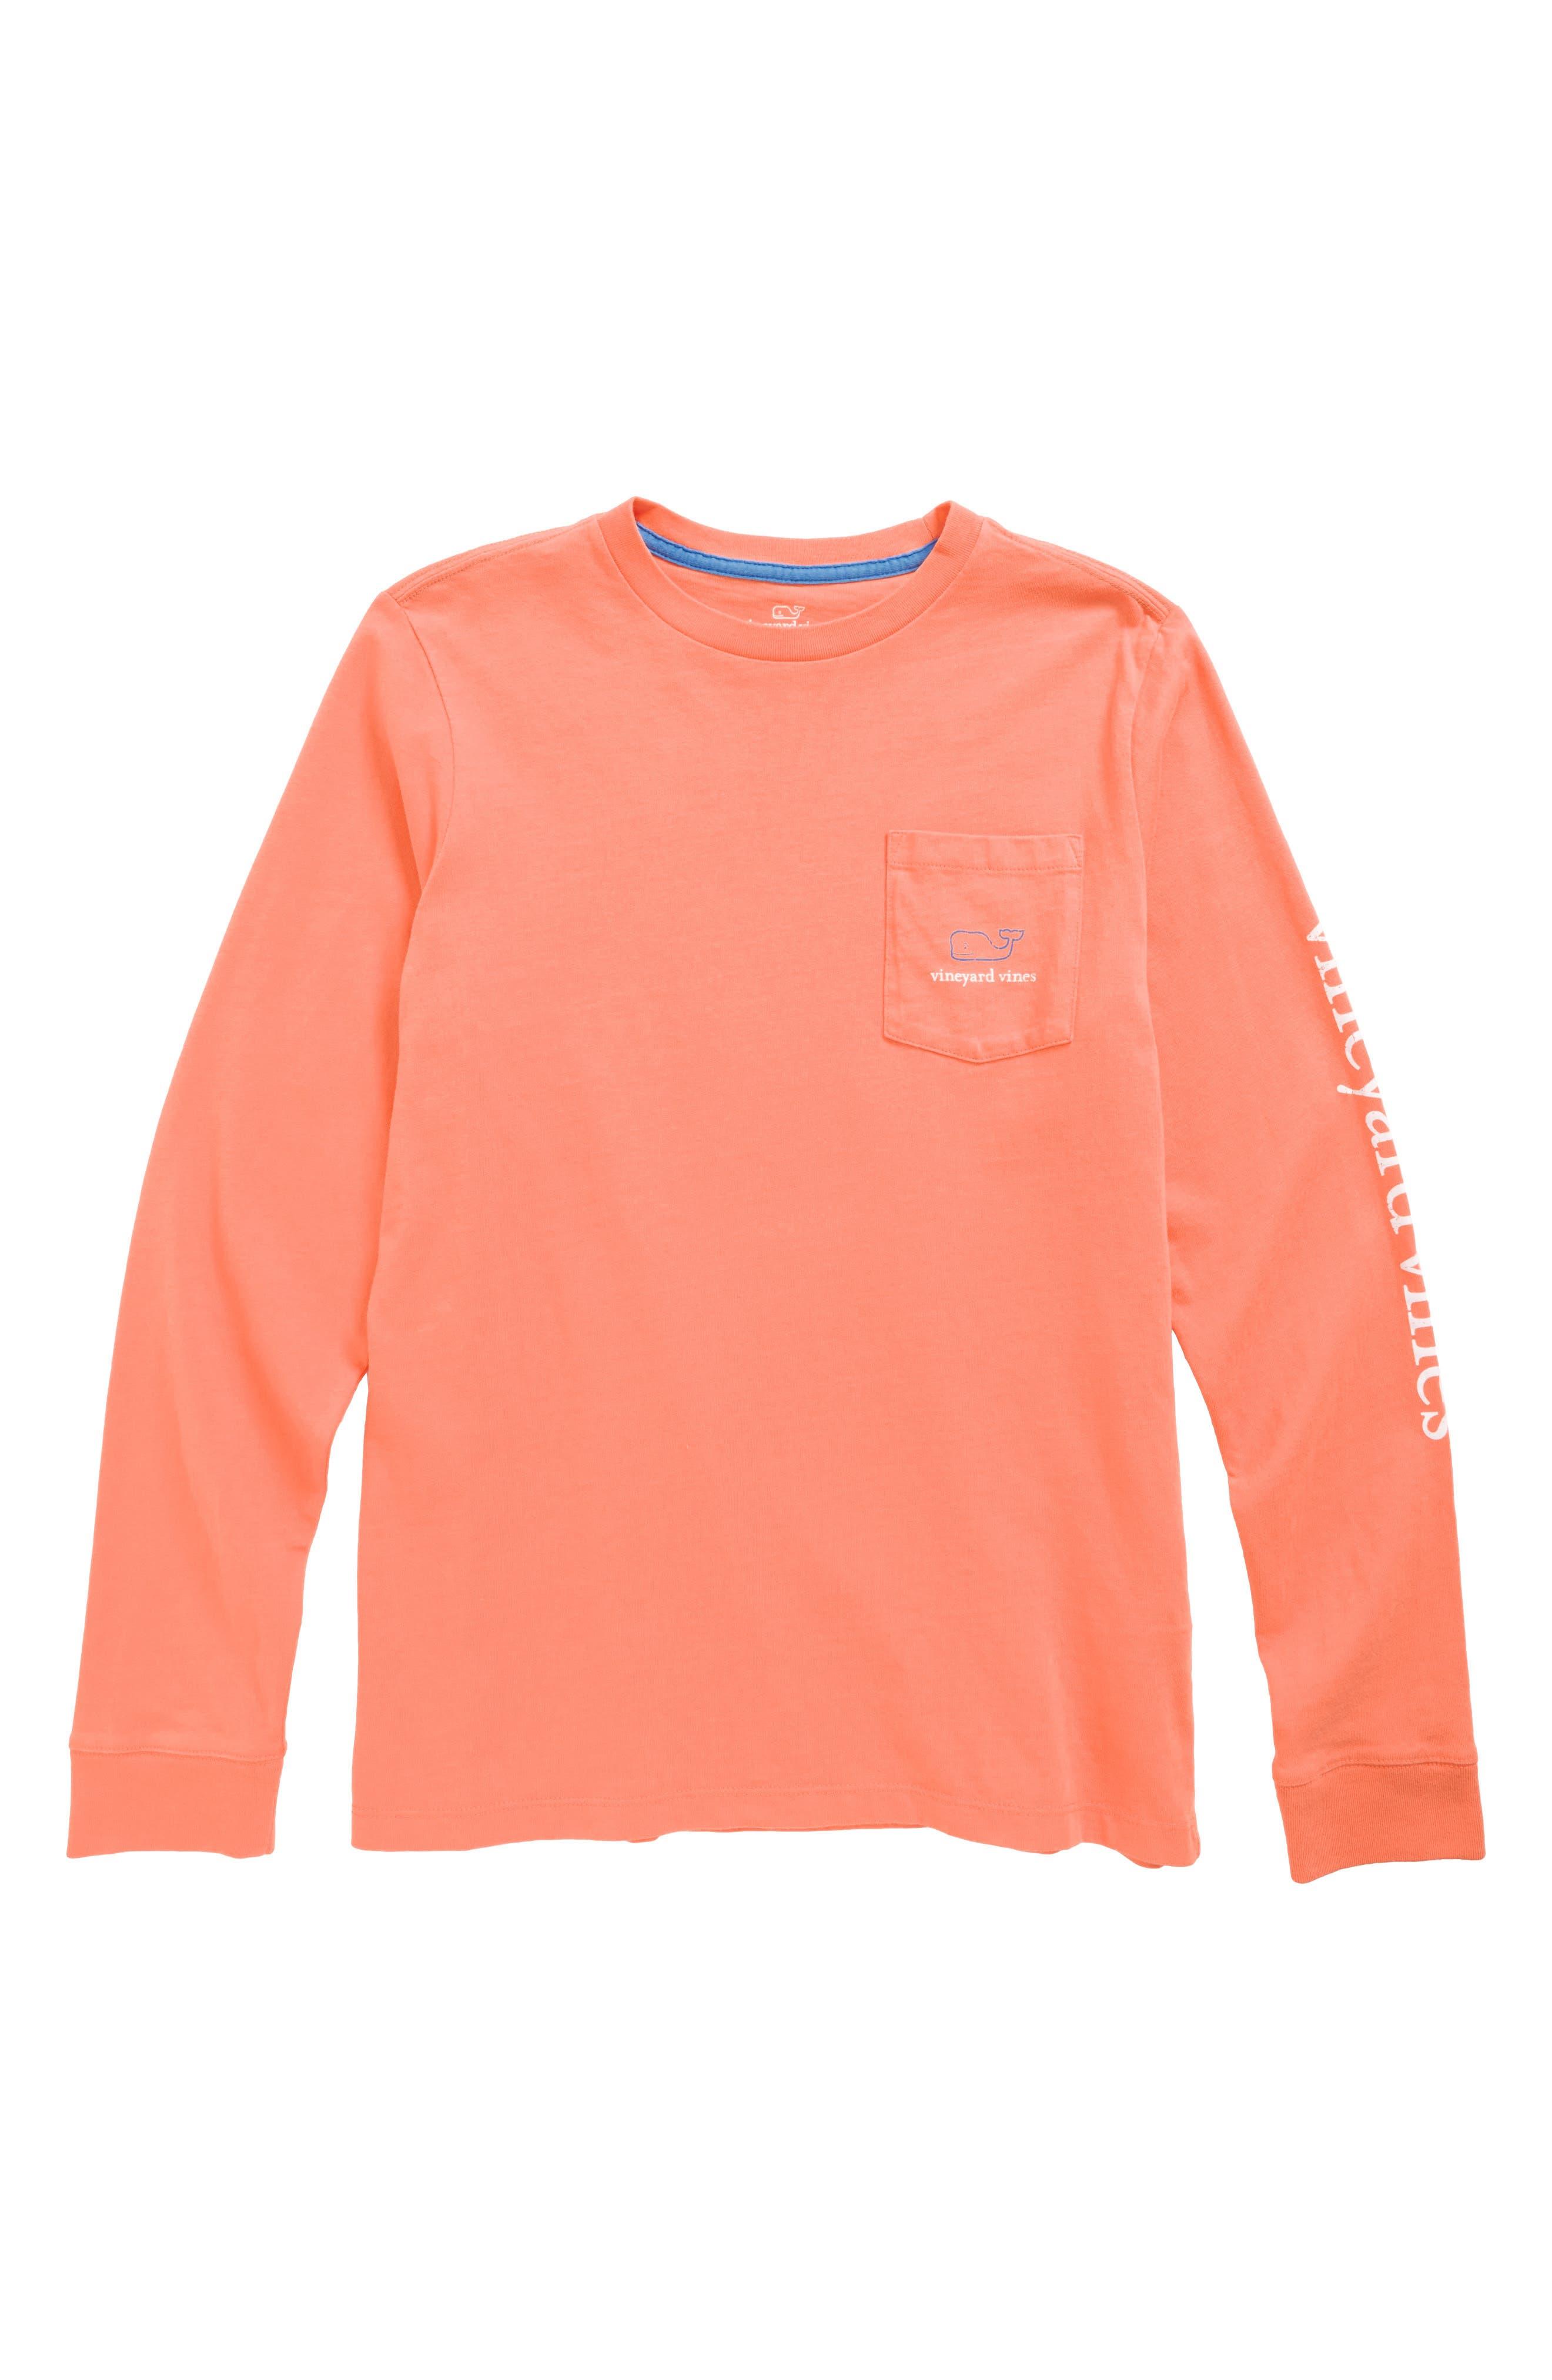 Vintage Whale Long Sleeve Pocket T-Shirt,                             Main thumbnail 5, color,